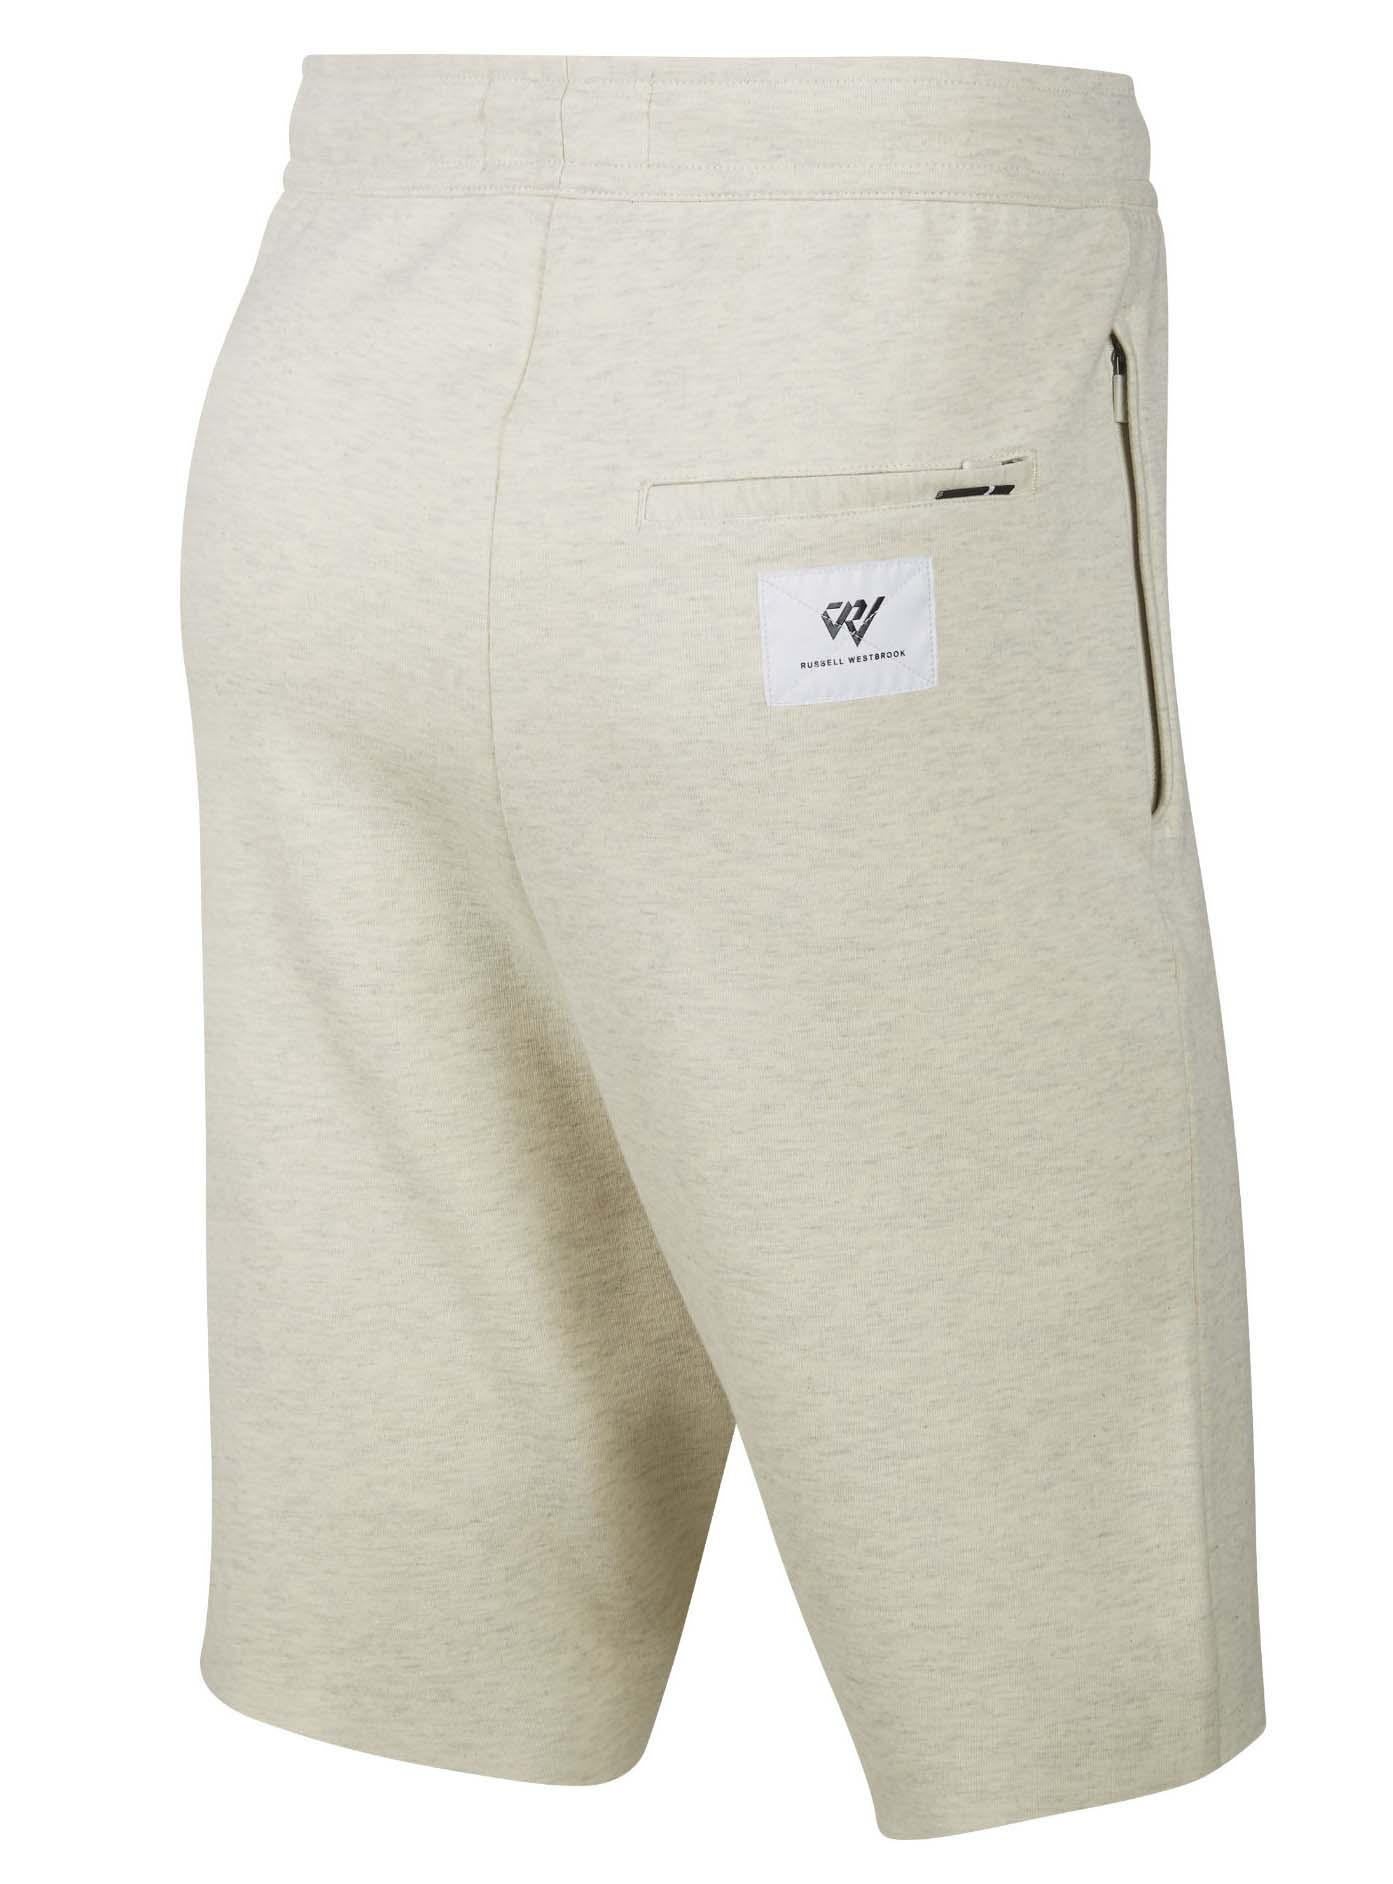 5e07eb5ef4c93f Jordan Men s Nike Russell Westbrook RW X JSW Fleece Shorts-Tan